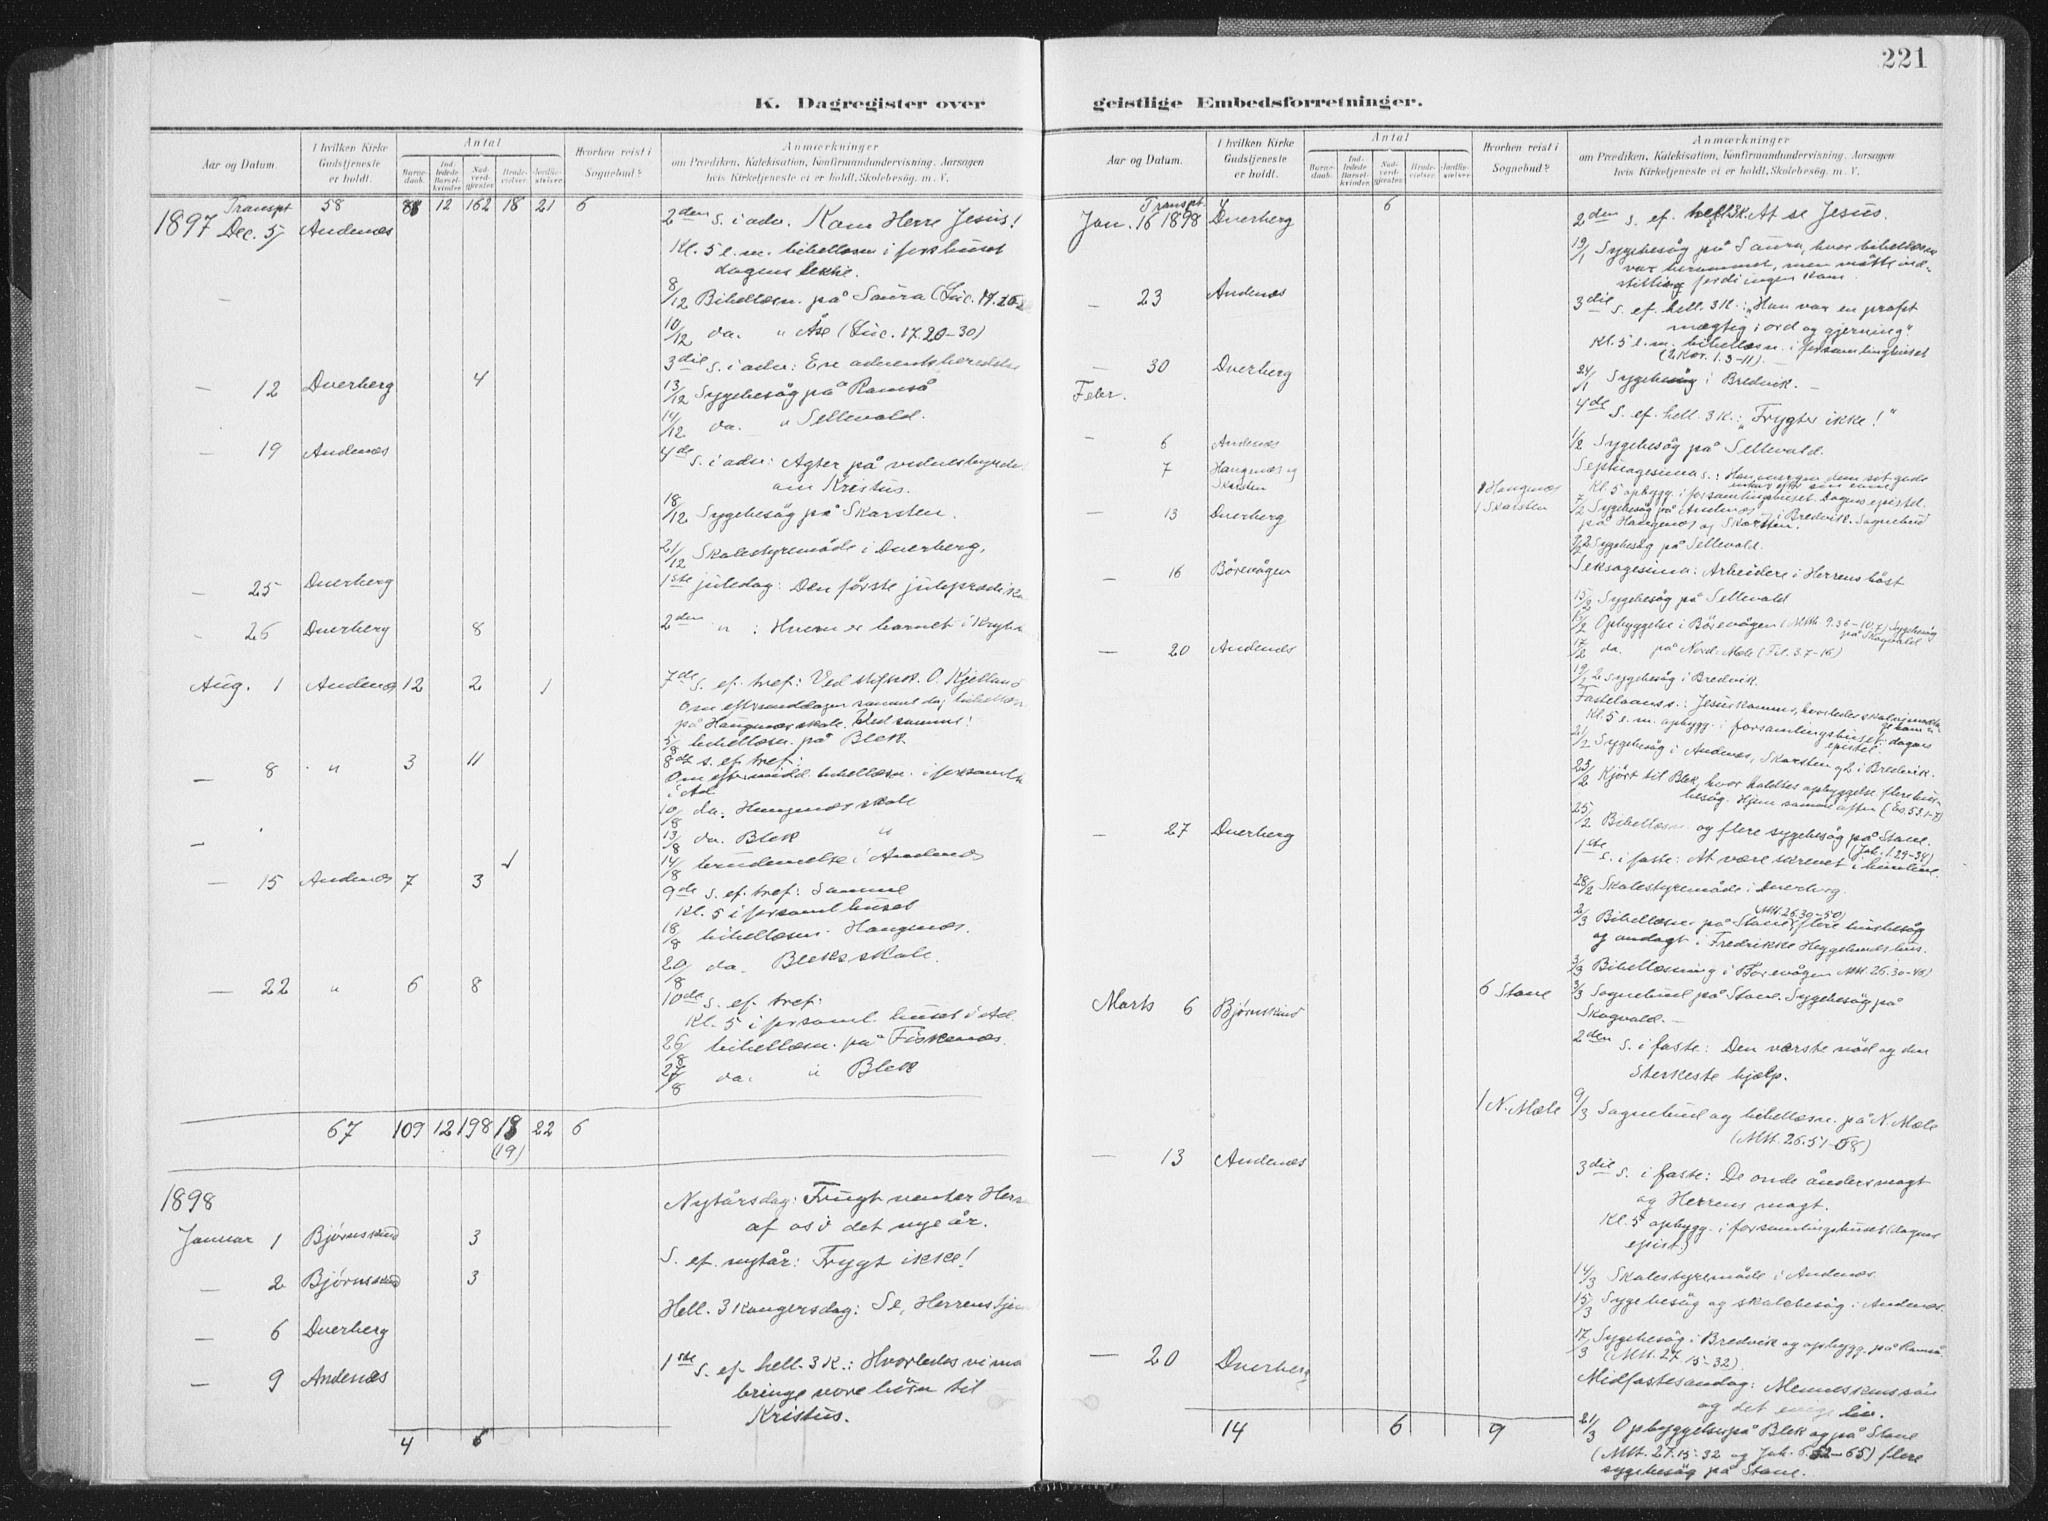 SAT, Ministerialprotokoller, klokkerbøker og fødselsregistre - Nordland, 897/L1400: Ministerialbok nr. 897A07, 1897-1908, s. 221